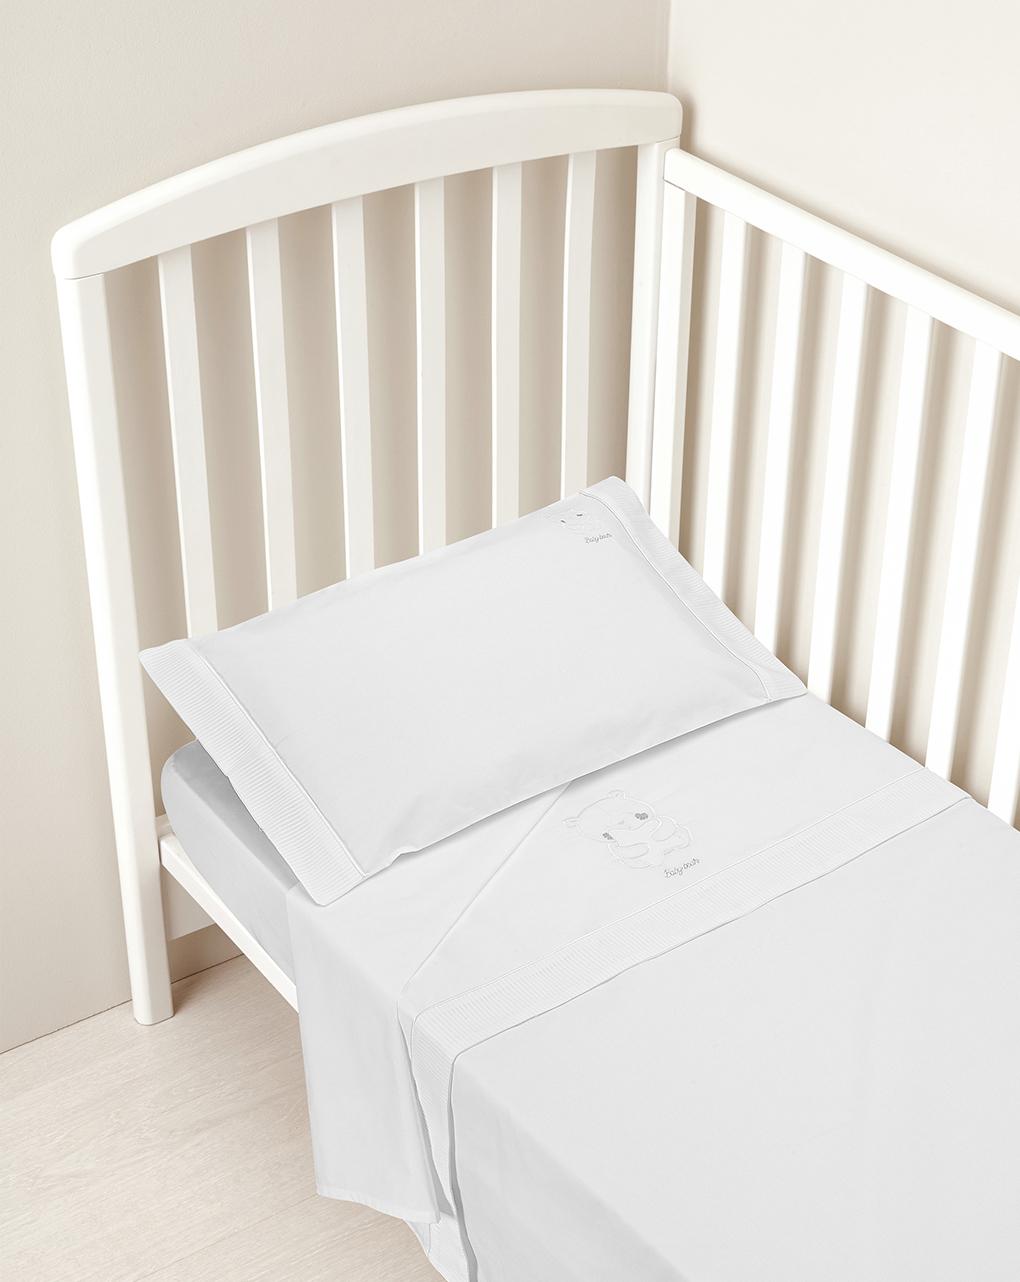 Prenatal Σετ για κρεβάτι 3 τεμ. Λευκό 20×60×135 εκ.